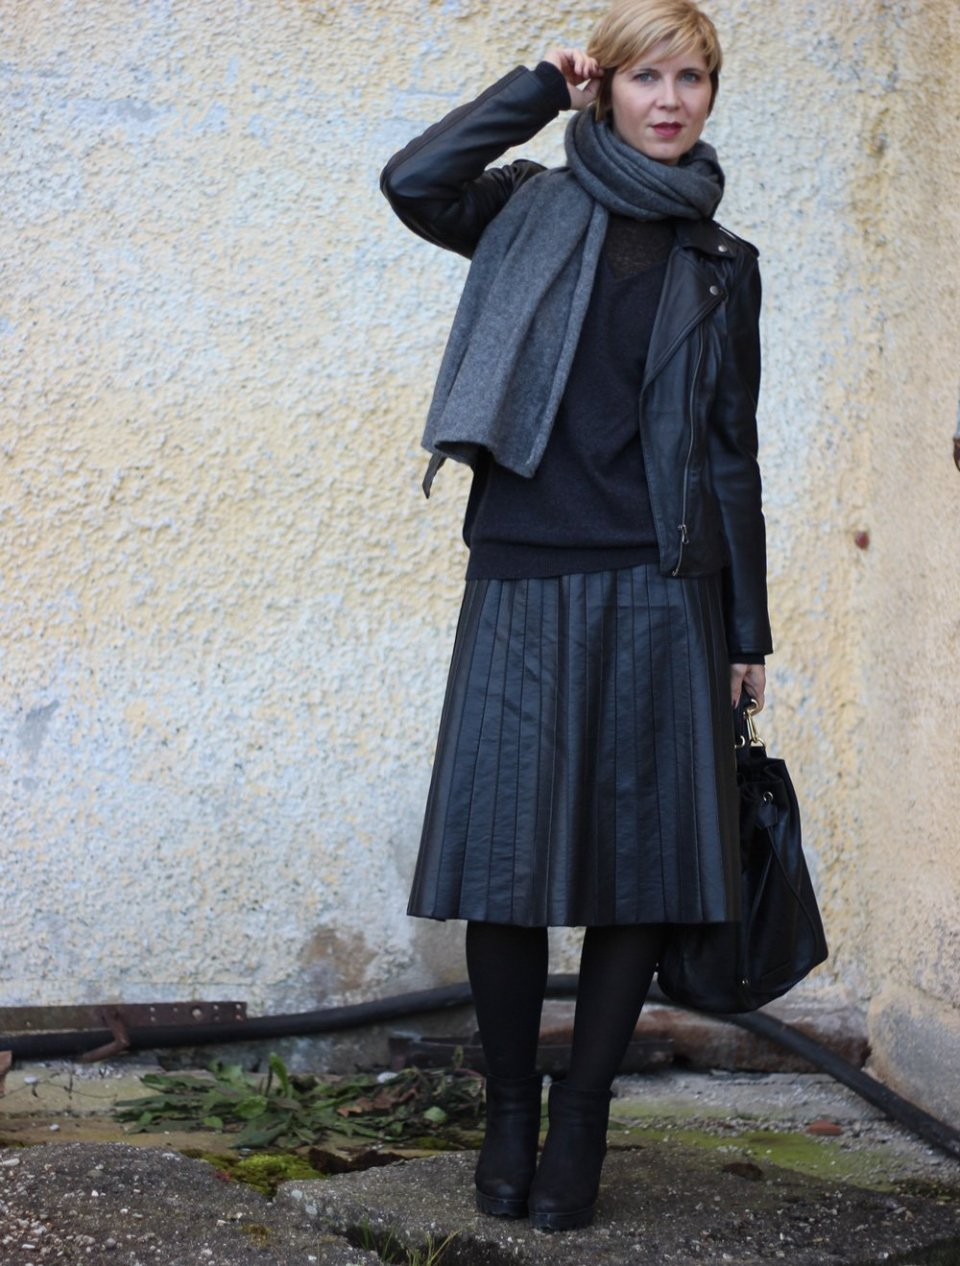 Fake leather, faltenrock, pleated skirt, schwarz, black, Tipp, Netzstrumpfhosen, Cashmere, Pullover, Boyfriendpullover, neyo, schwarz, Kaschmirpullover, Lederjacke, Bikerjacke, Conny Doll